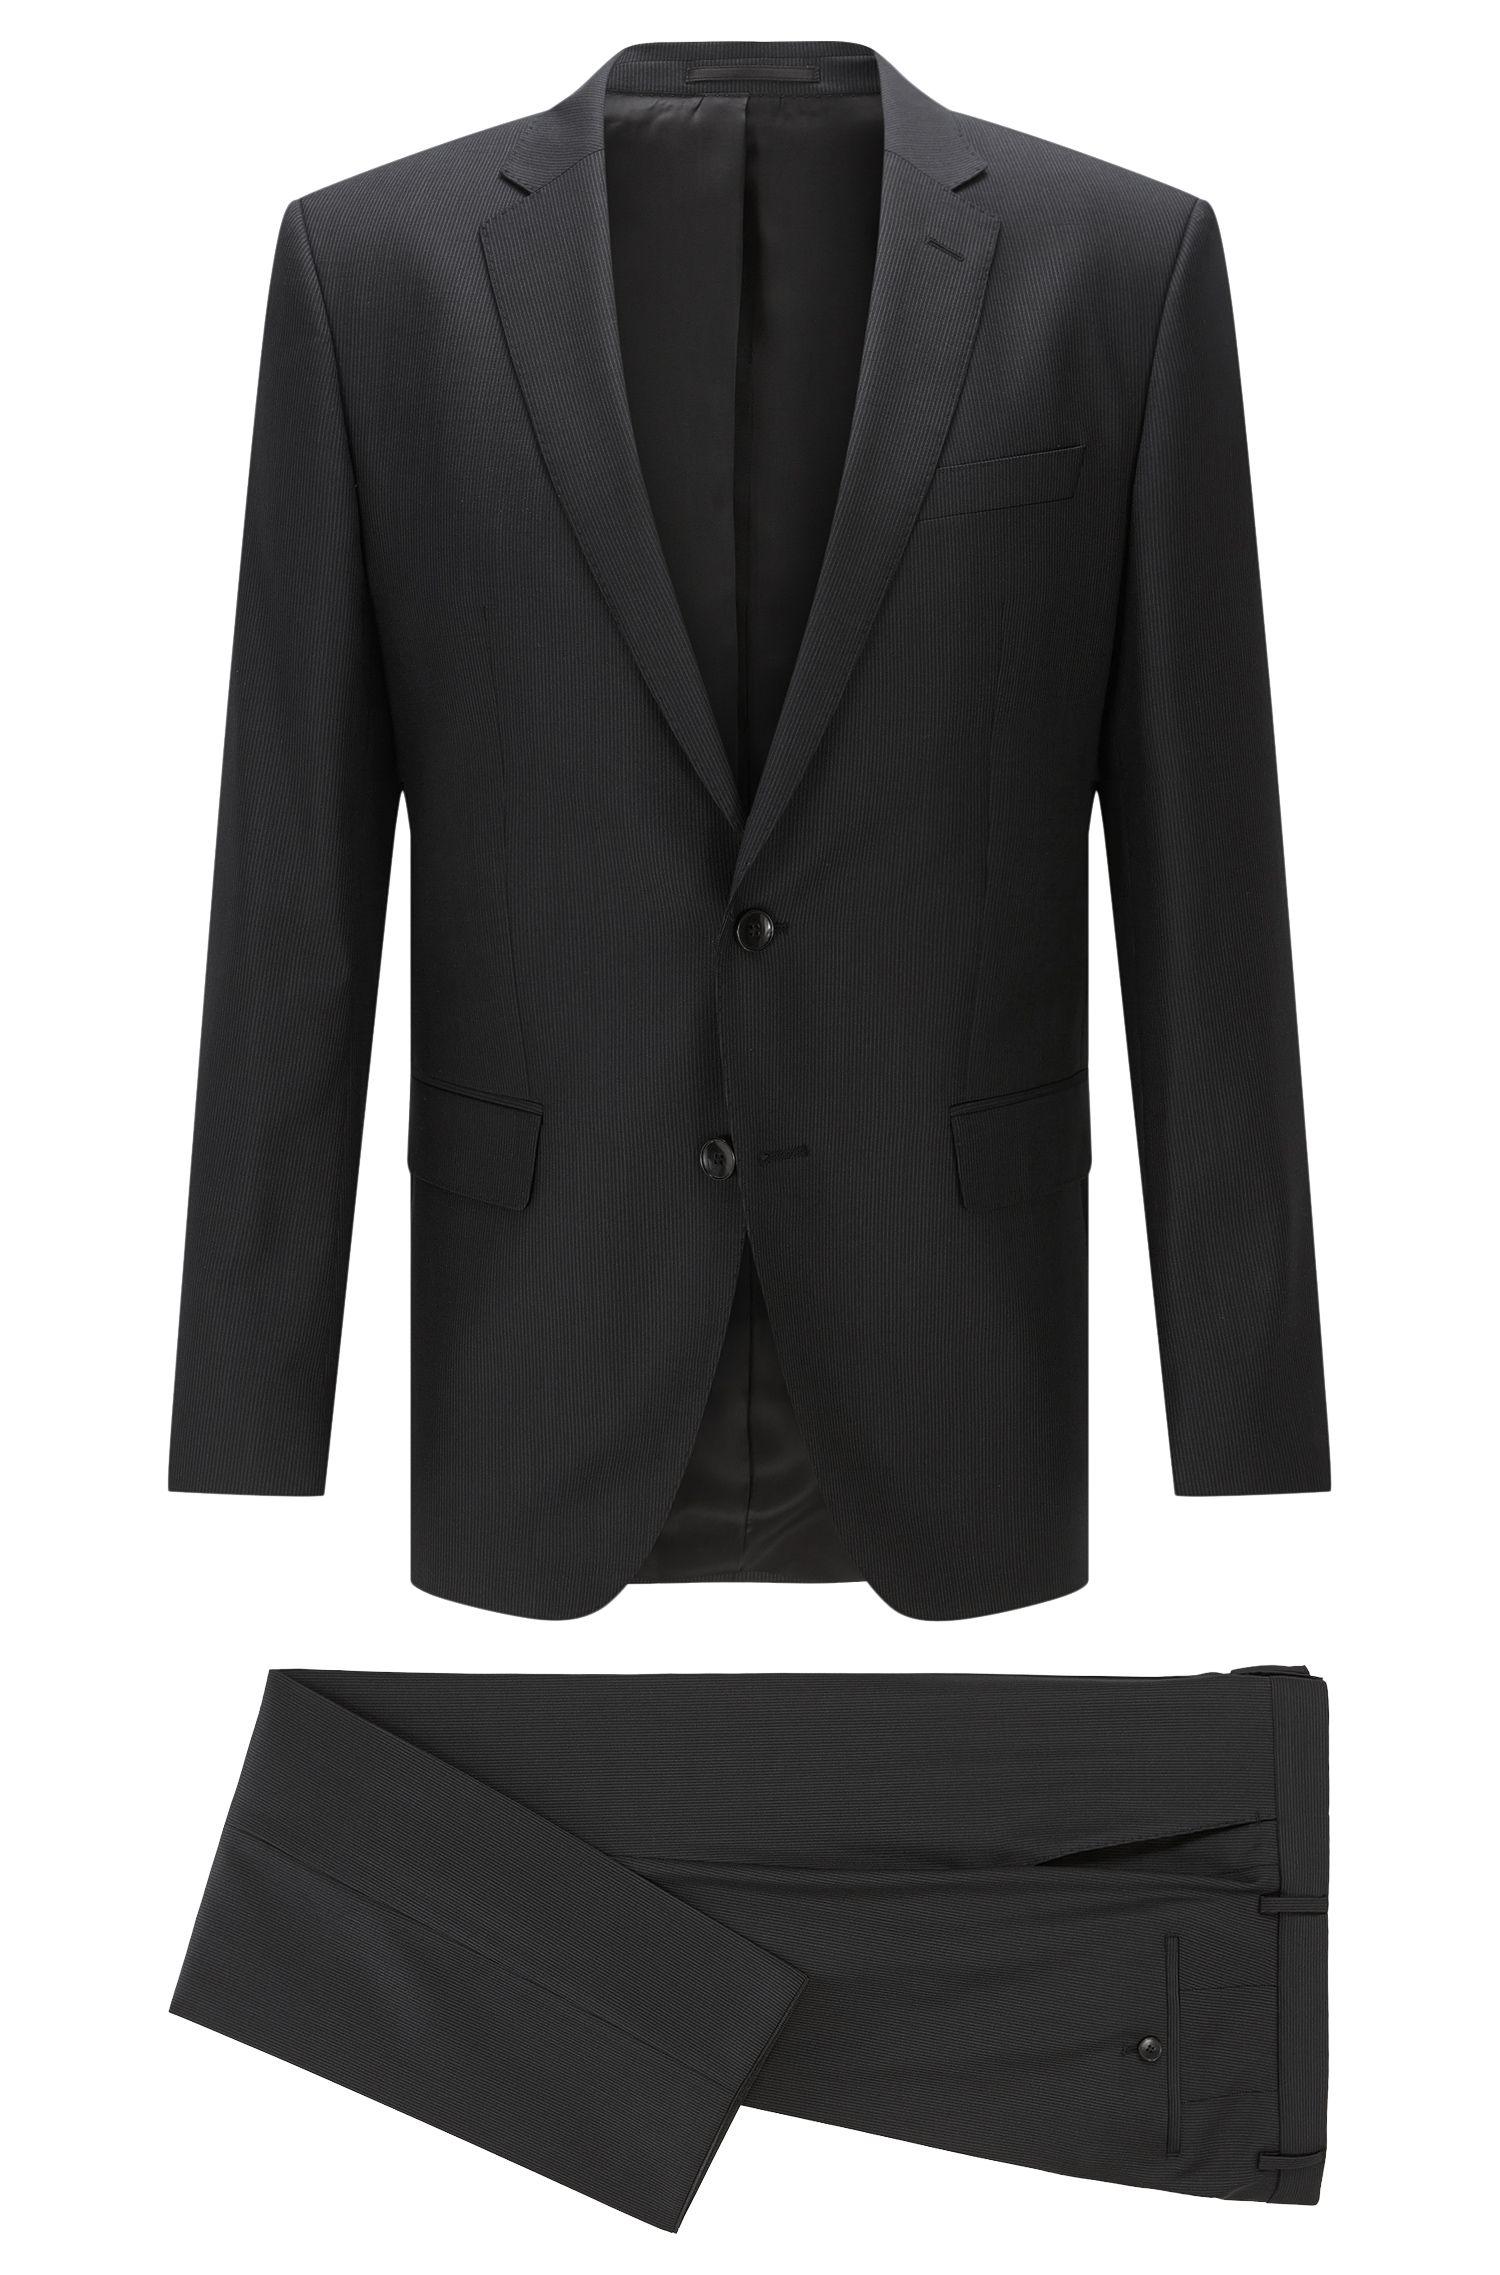 'Huge/Genius' | Slim Fit, Tonal Striped Italian Super 110 Virgin Wool Suit